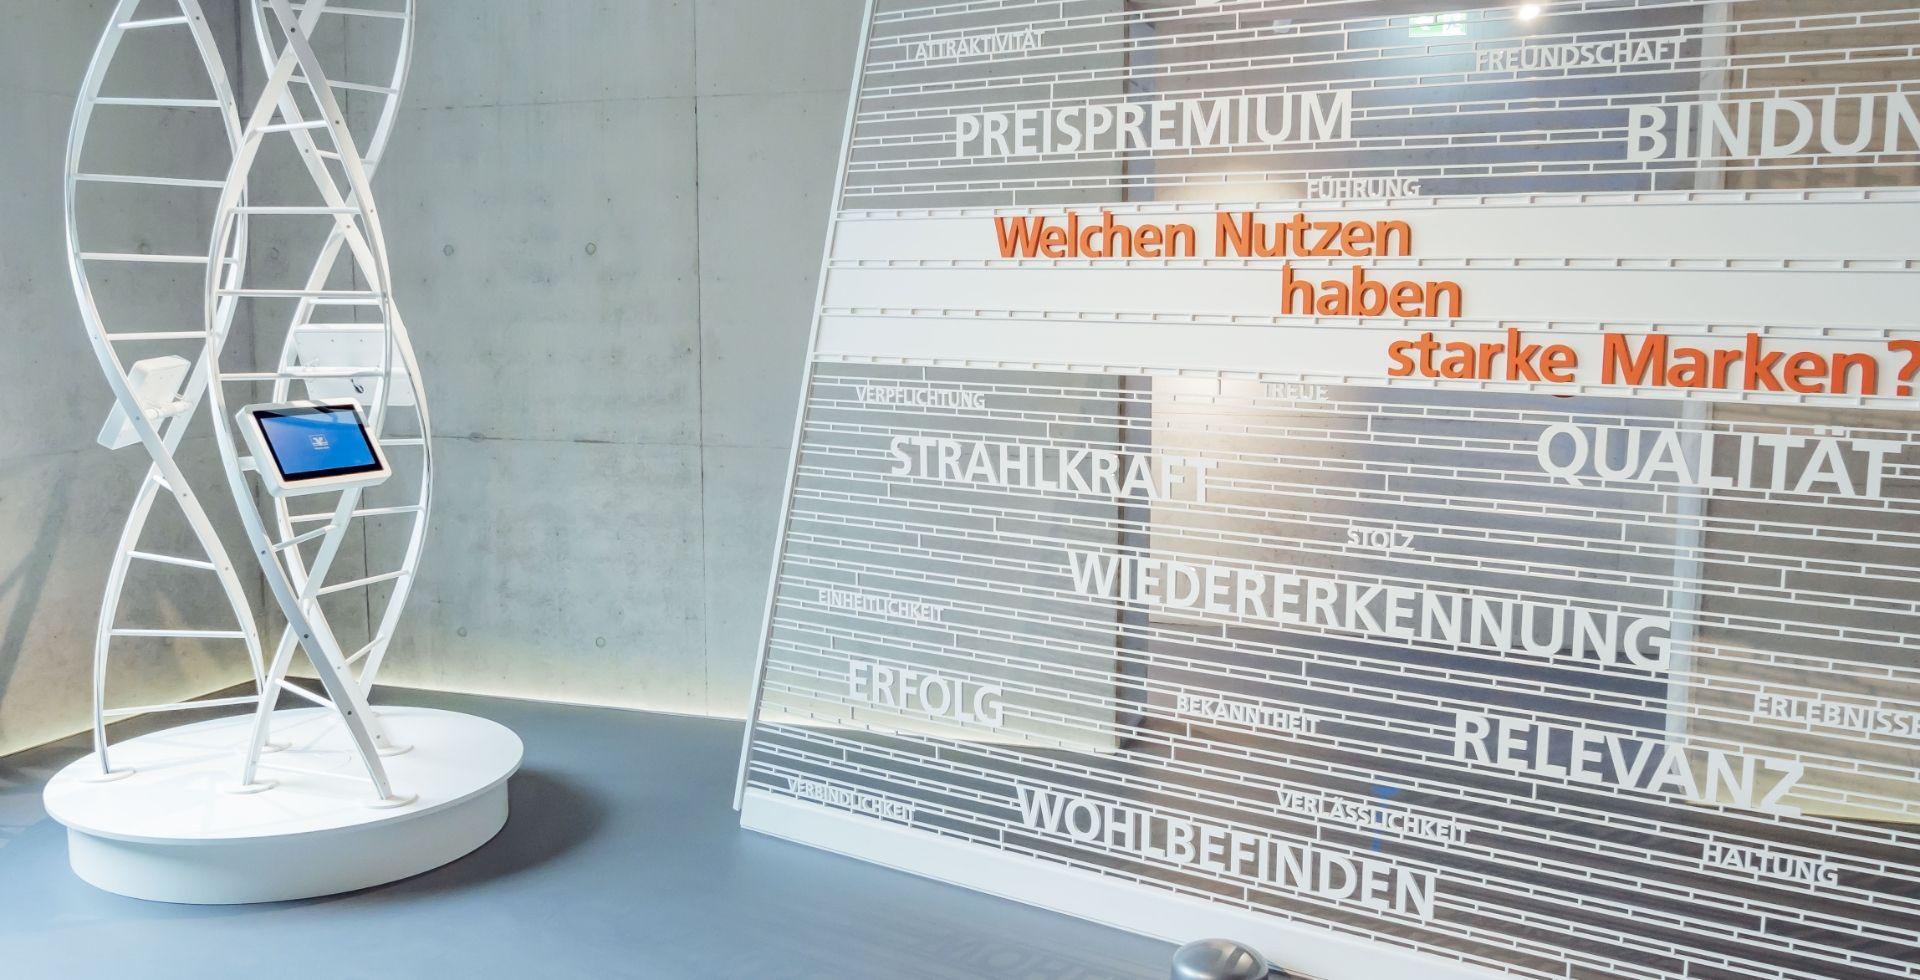 Volksbanken Raiffeisenbanken - Markenturm - Schloß Montabaur - Showroom - Multimedia - Creative Technology - Interactive Experience - Customer Journey - Touchanwendungen - Quizgames -  realtime visions